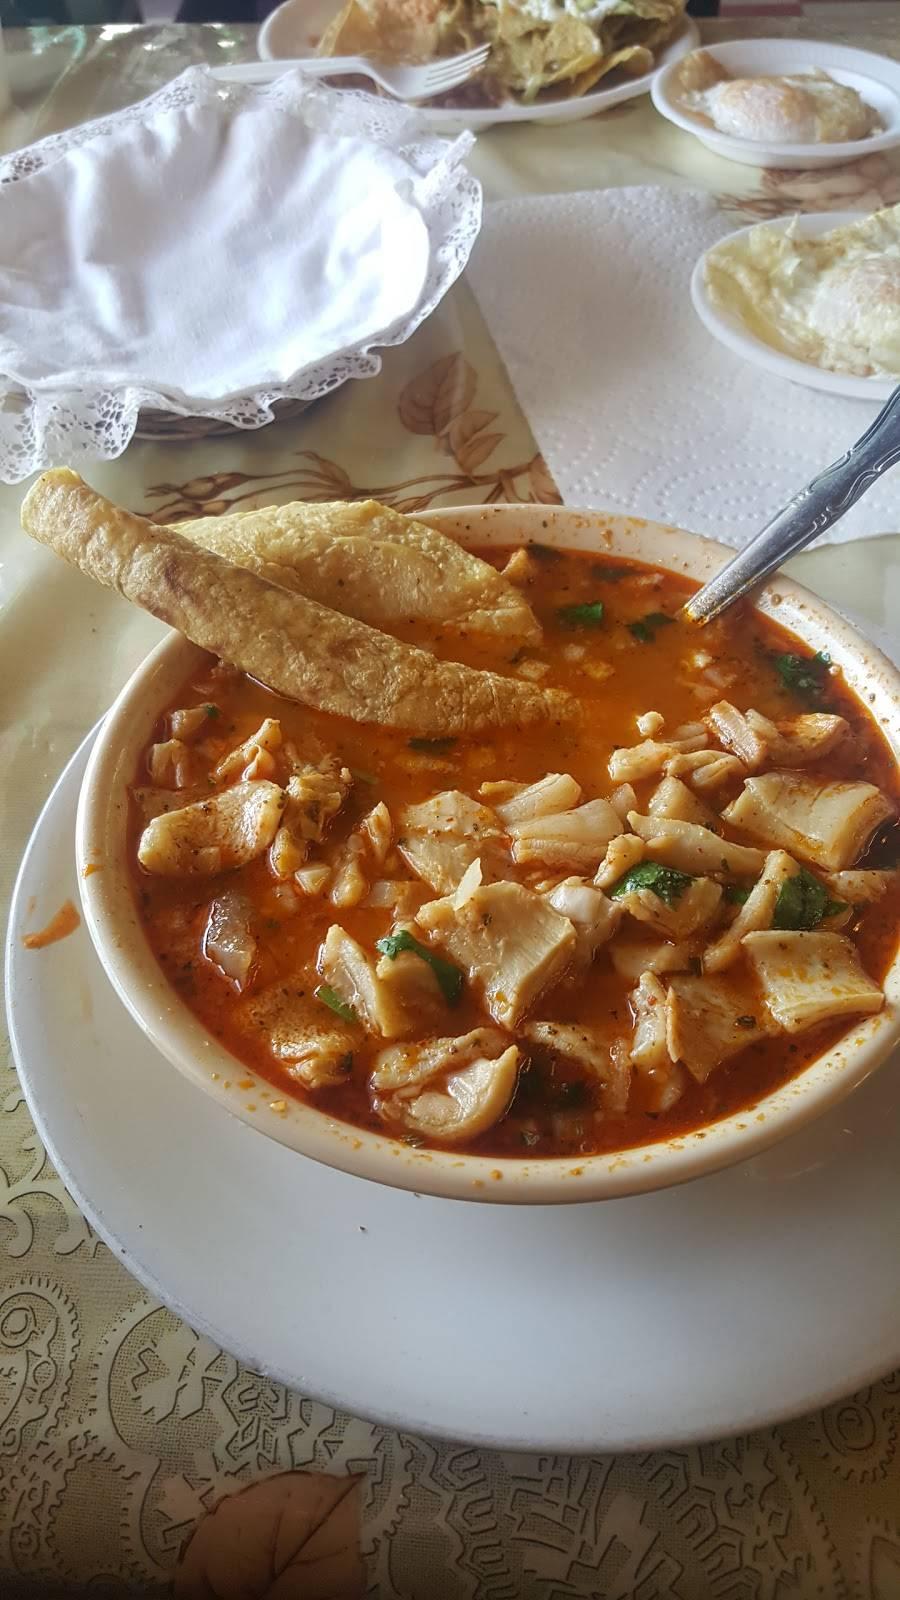 El Jayamitla   restaurant   13382 Sayre St, Sylmar, CA 91342, USA   8183645808 OR +1 818-364-5808